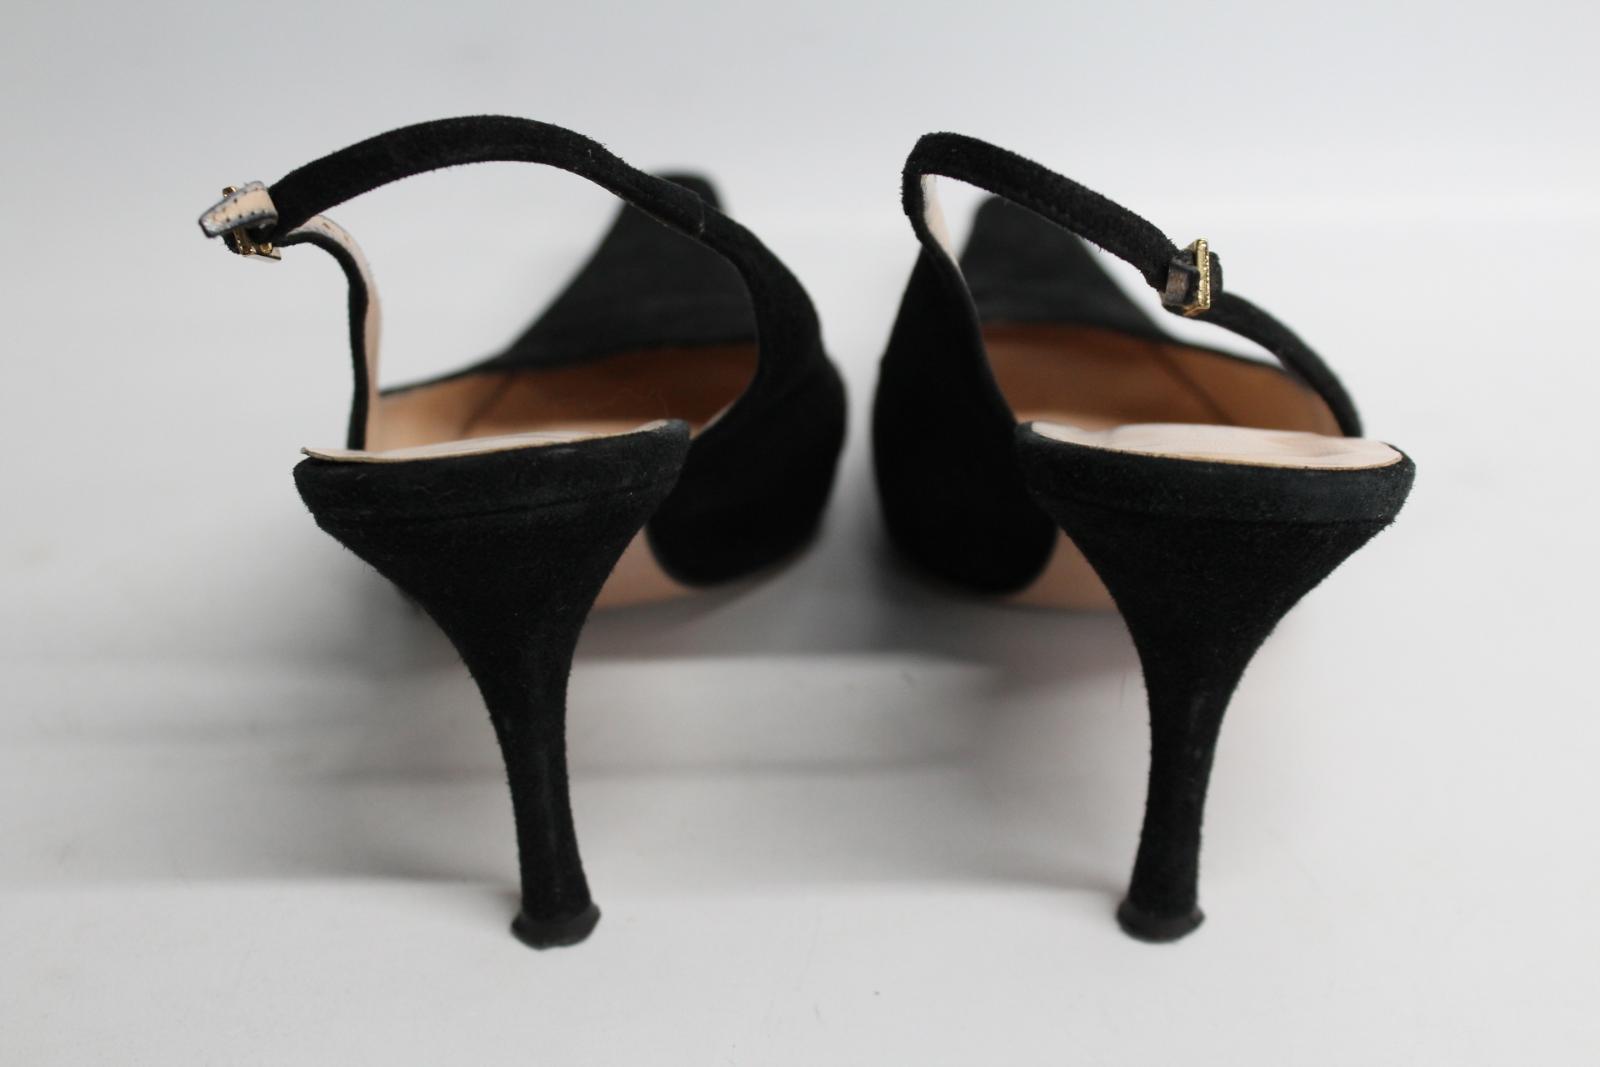 Hobbs-femmes-en-daim-noir-Sling-Arriere-bout-pointu-et-talon-aiguille-Chaussure-UK6-5-EU39-5 miniature 6